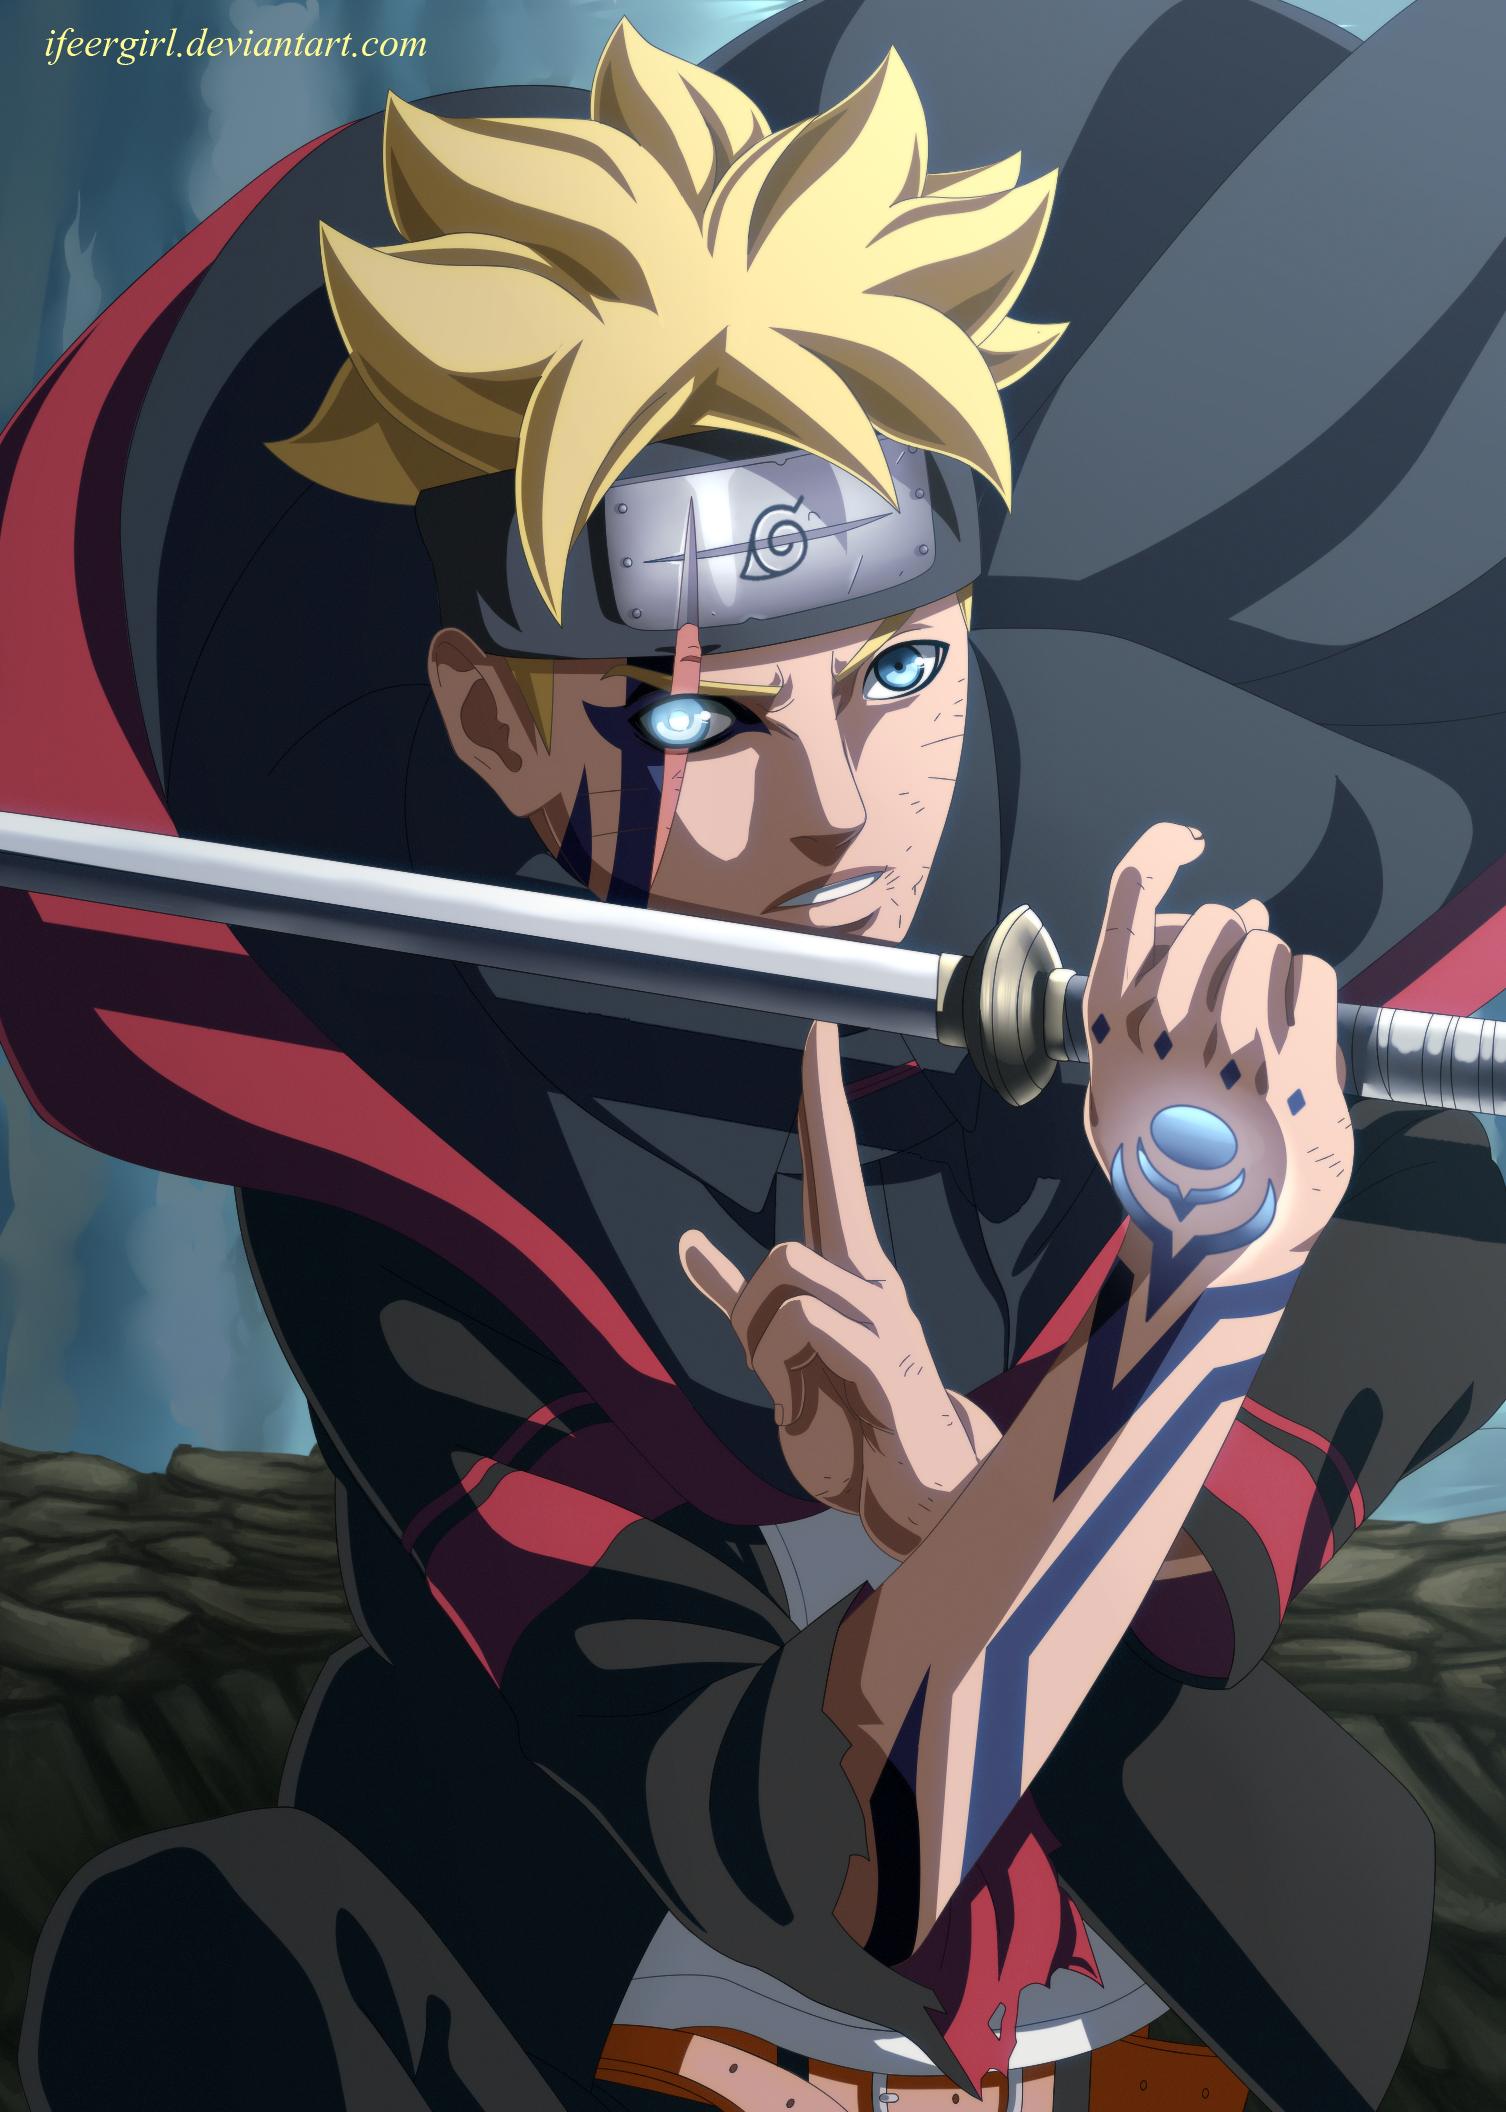 Wallpaper Naruto The Movie 7